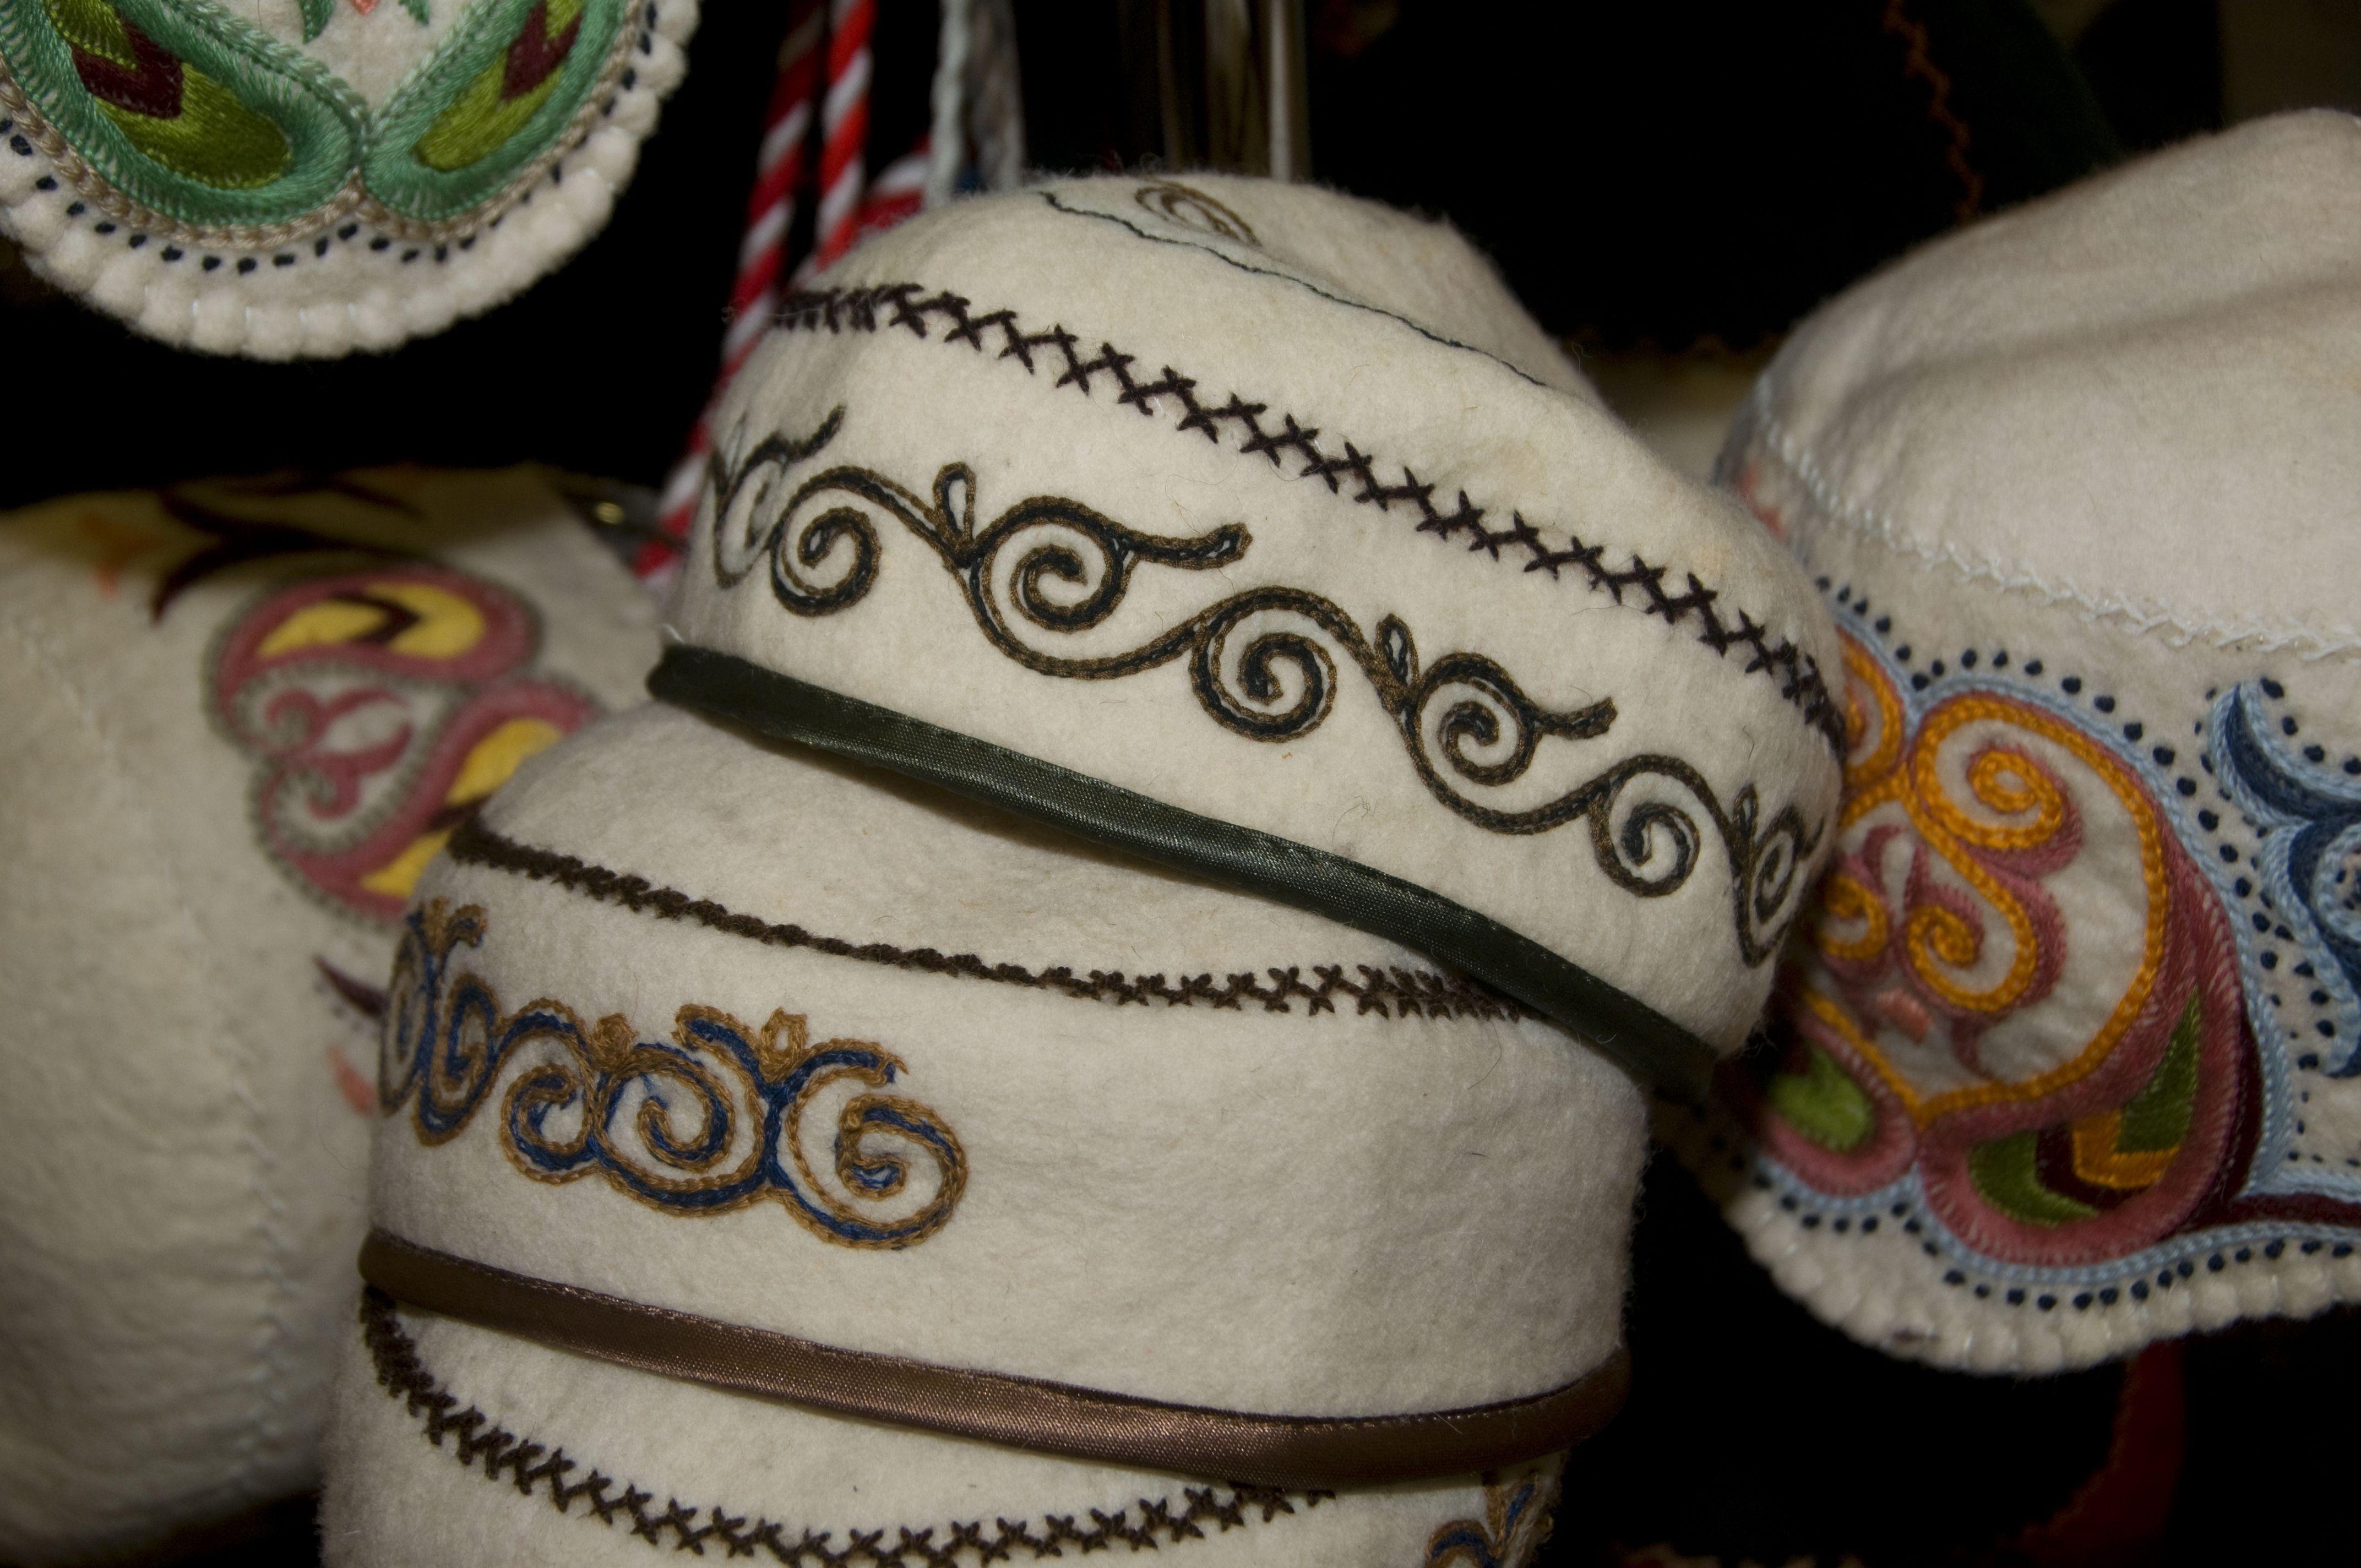 Tubeteika hats